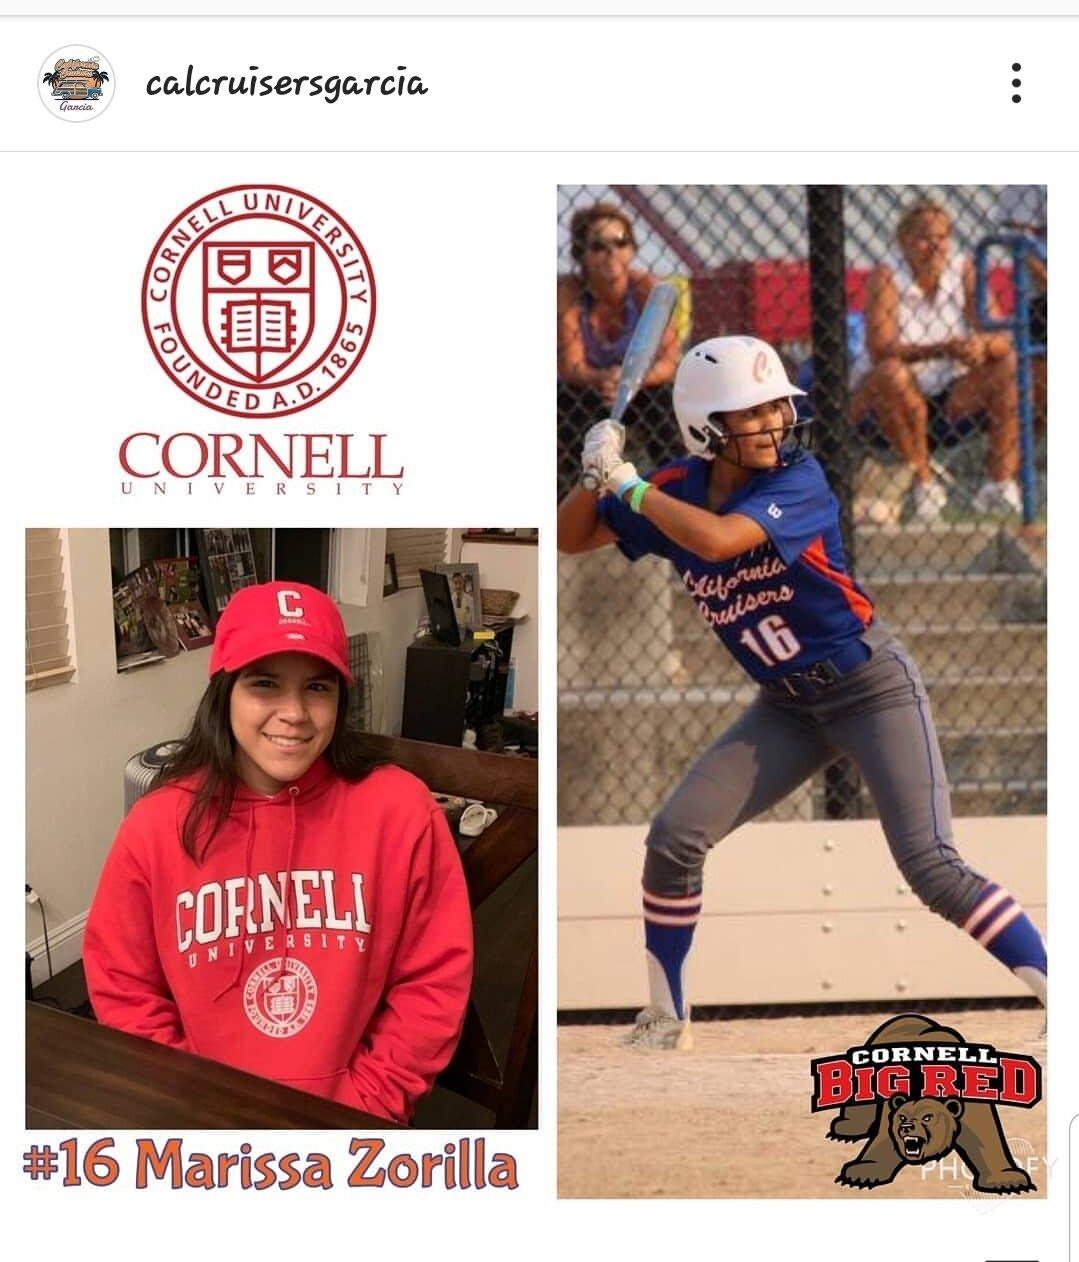 #16 MARISSA ZORILLA   Highlight Video: Click on Image  Grad Year: 2020  Position(s): 2B/OF  High School: Ayala  College: Cornell